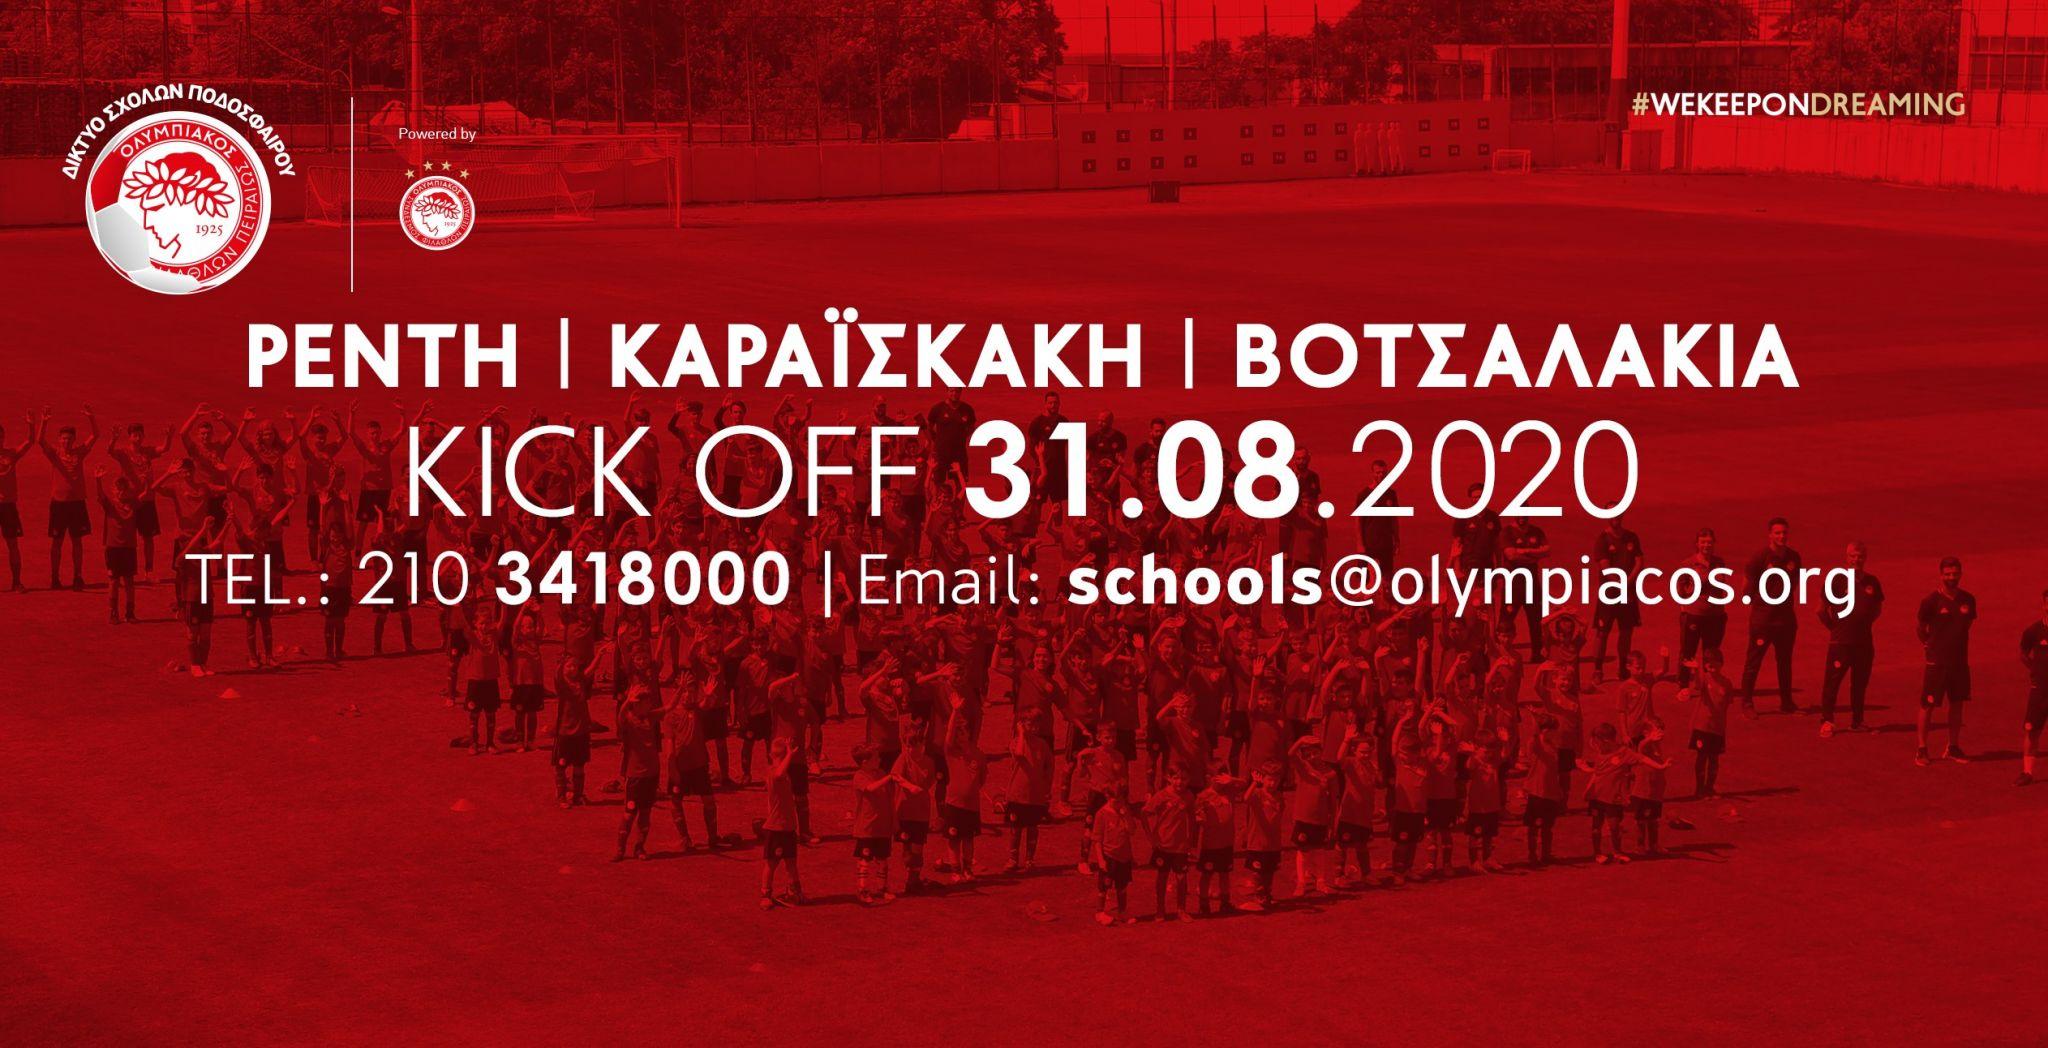 Mε προτεραιότητα την ασφάλεια ξεκινούν οι Κεντρικές Σχολές του Ολυμπιακού